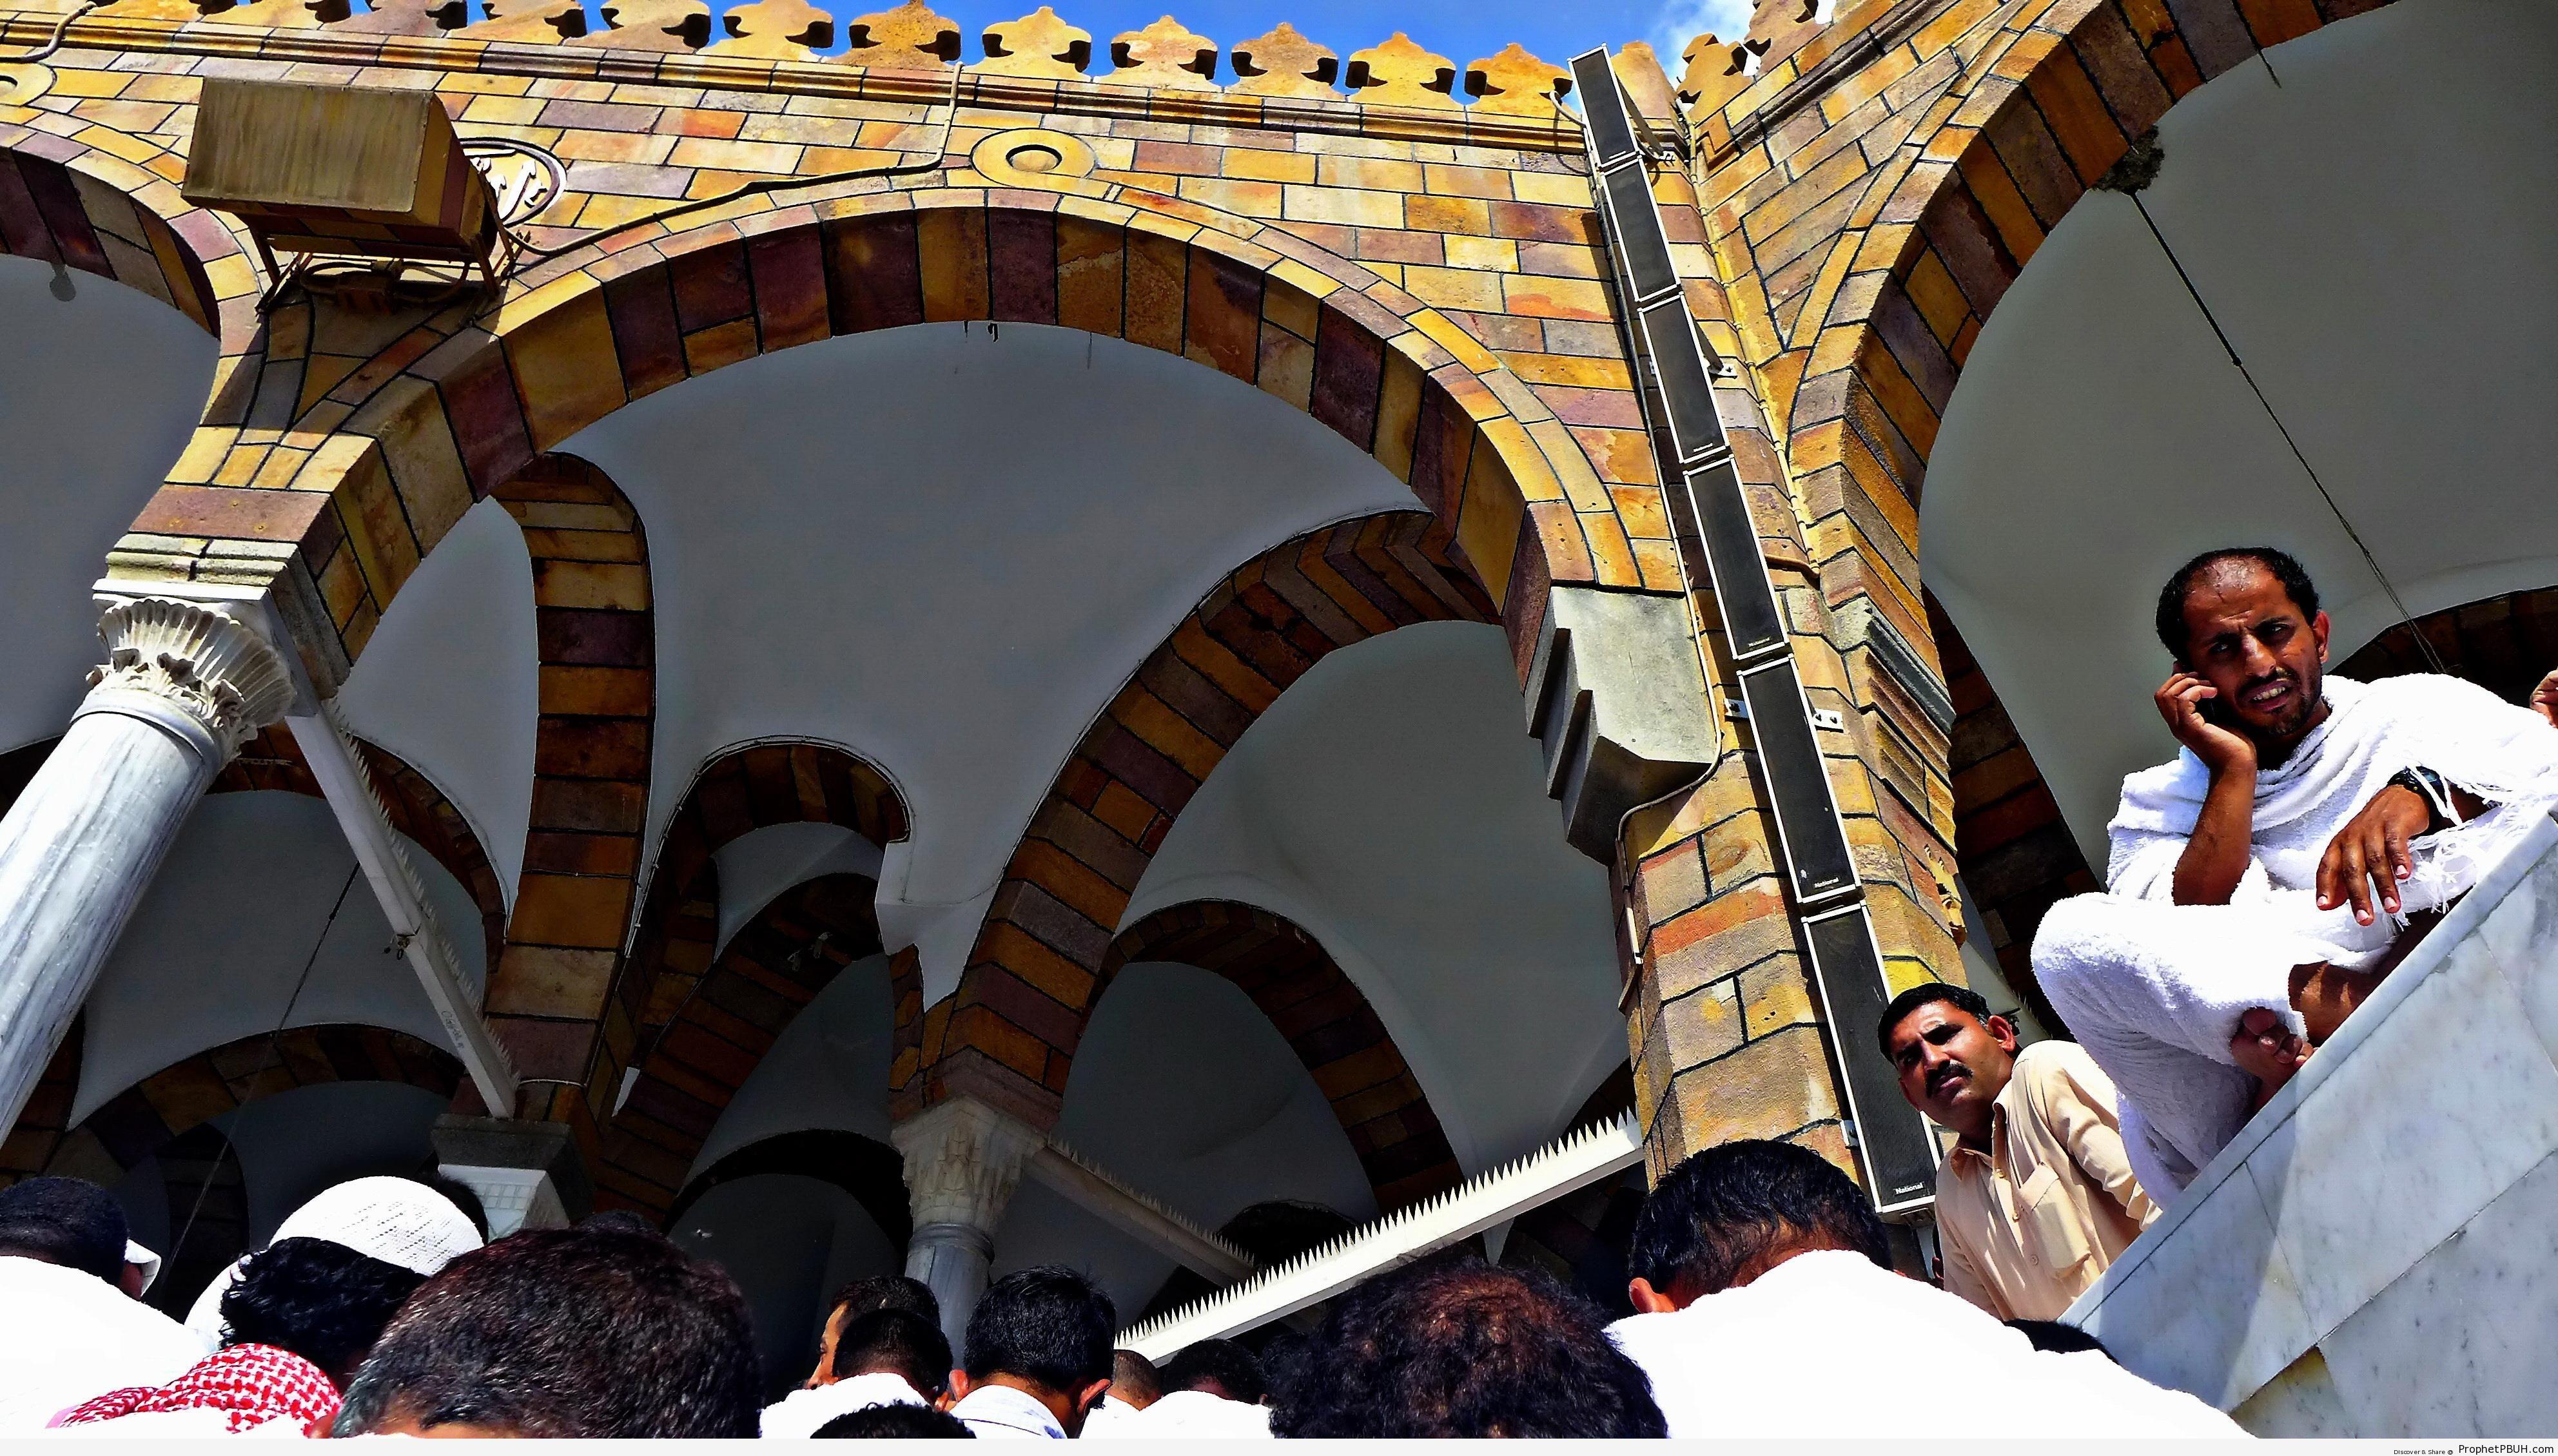 Men Walking Into Masjid al-Haram for Friday Prayers (Makkah, Saudi Arabia) - al-Masjid al-Haram in Makkah, Saudi Arabia -Picture